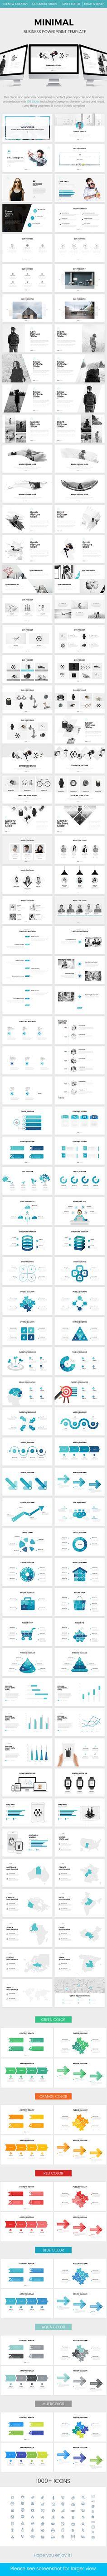 Minimal Business Keynote Template — Keynote KEY #multipurpose #clean layouts • Download ➝ https://graphicriver.net/item/minimal-business-keynote-template/20097542?ref=pxcr